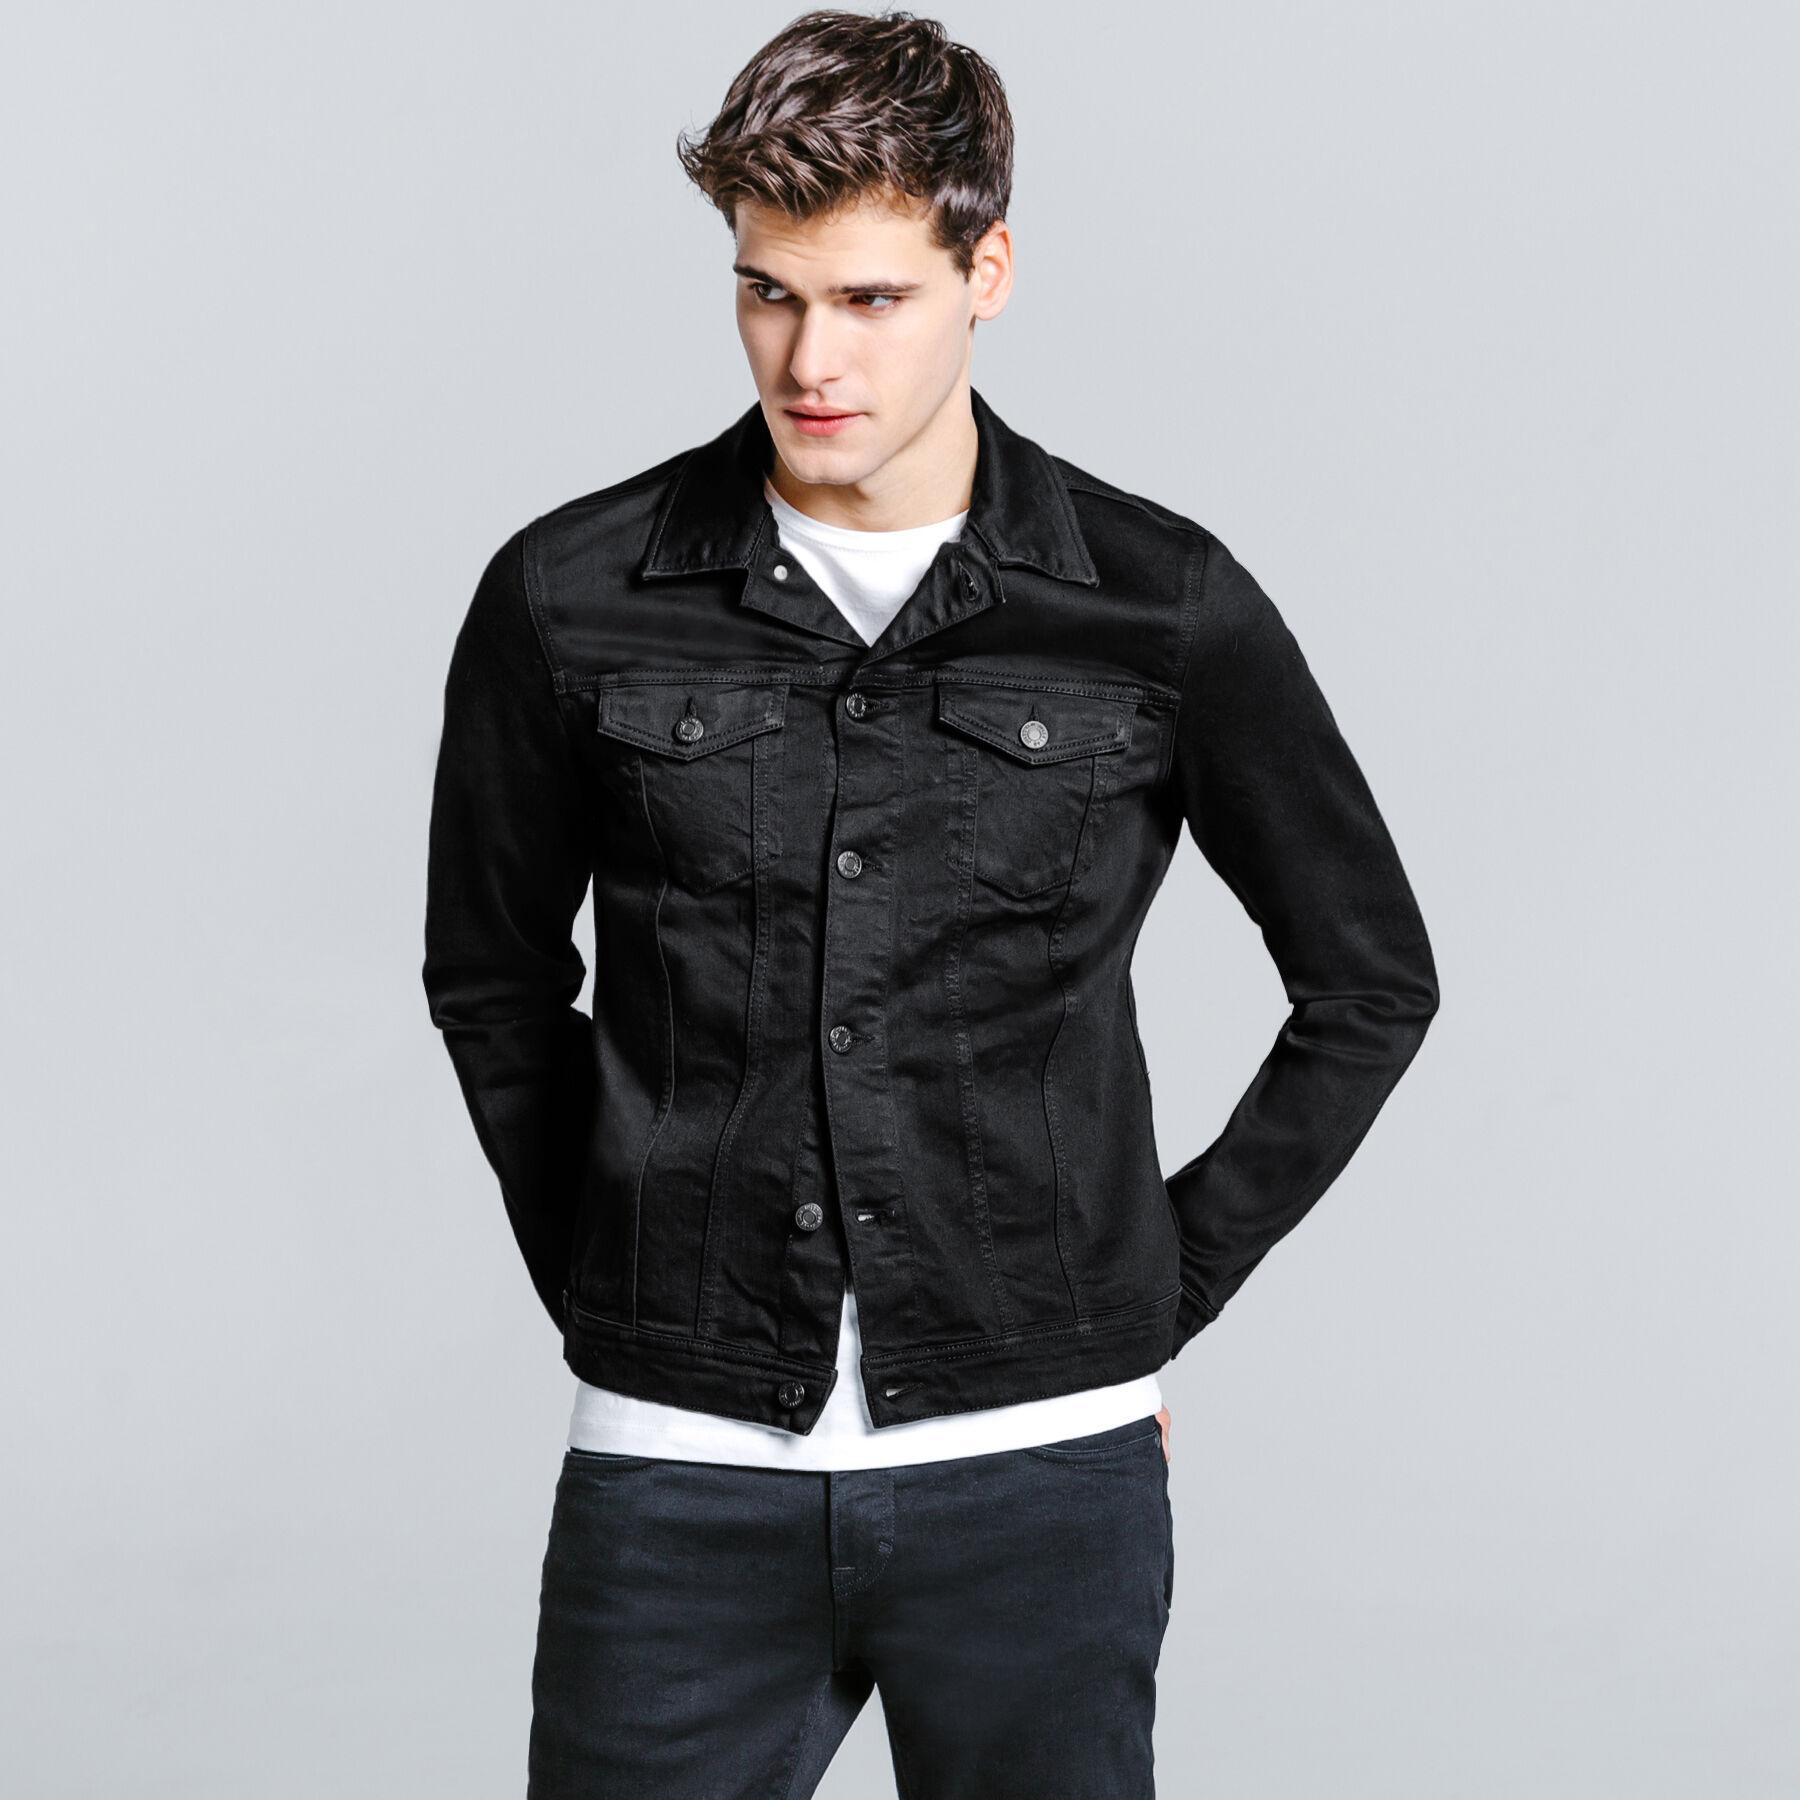 magasin en ligne abe74 aad24 Blouson en jean col chemise Homme - Jules